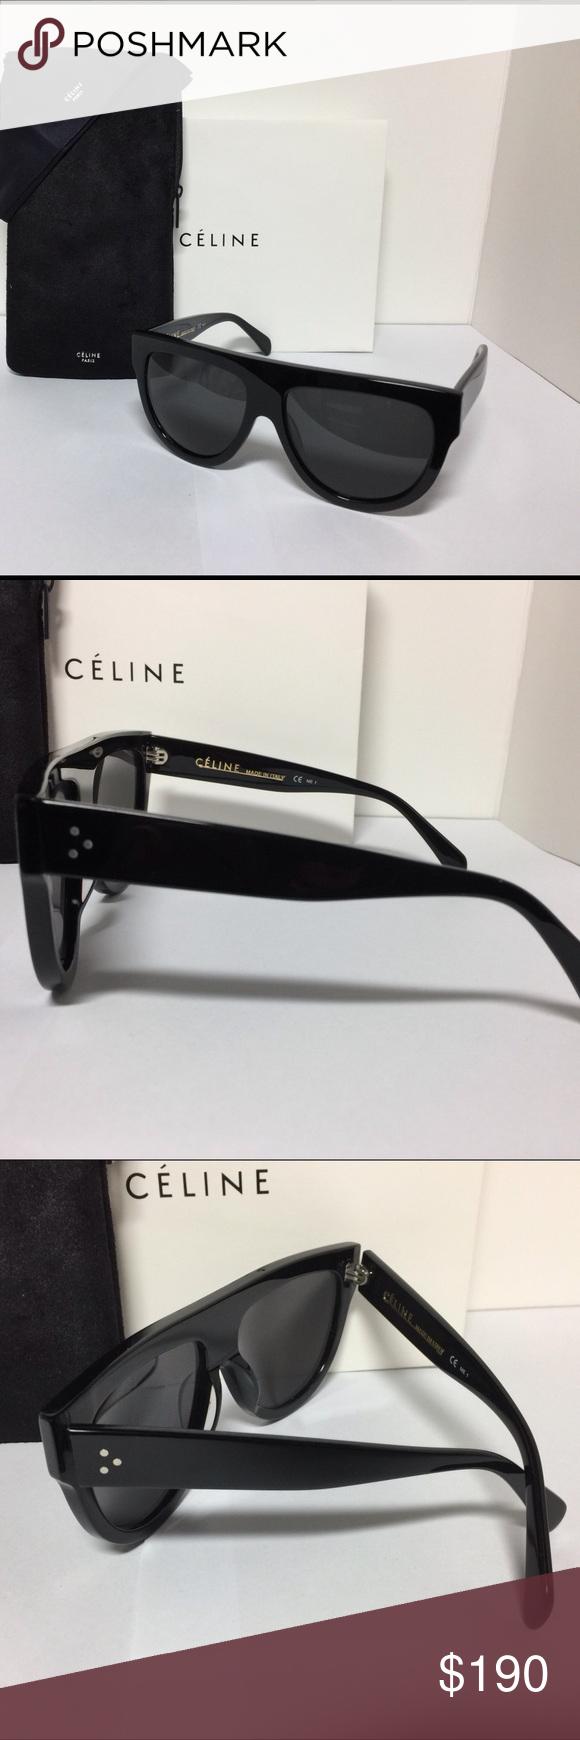 70b21b28ca73 celine sunglasses italy